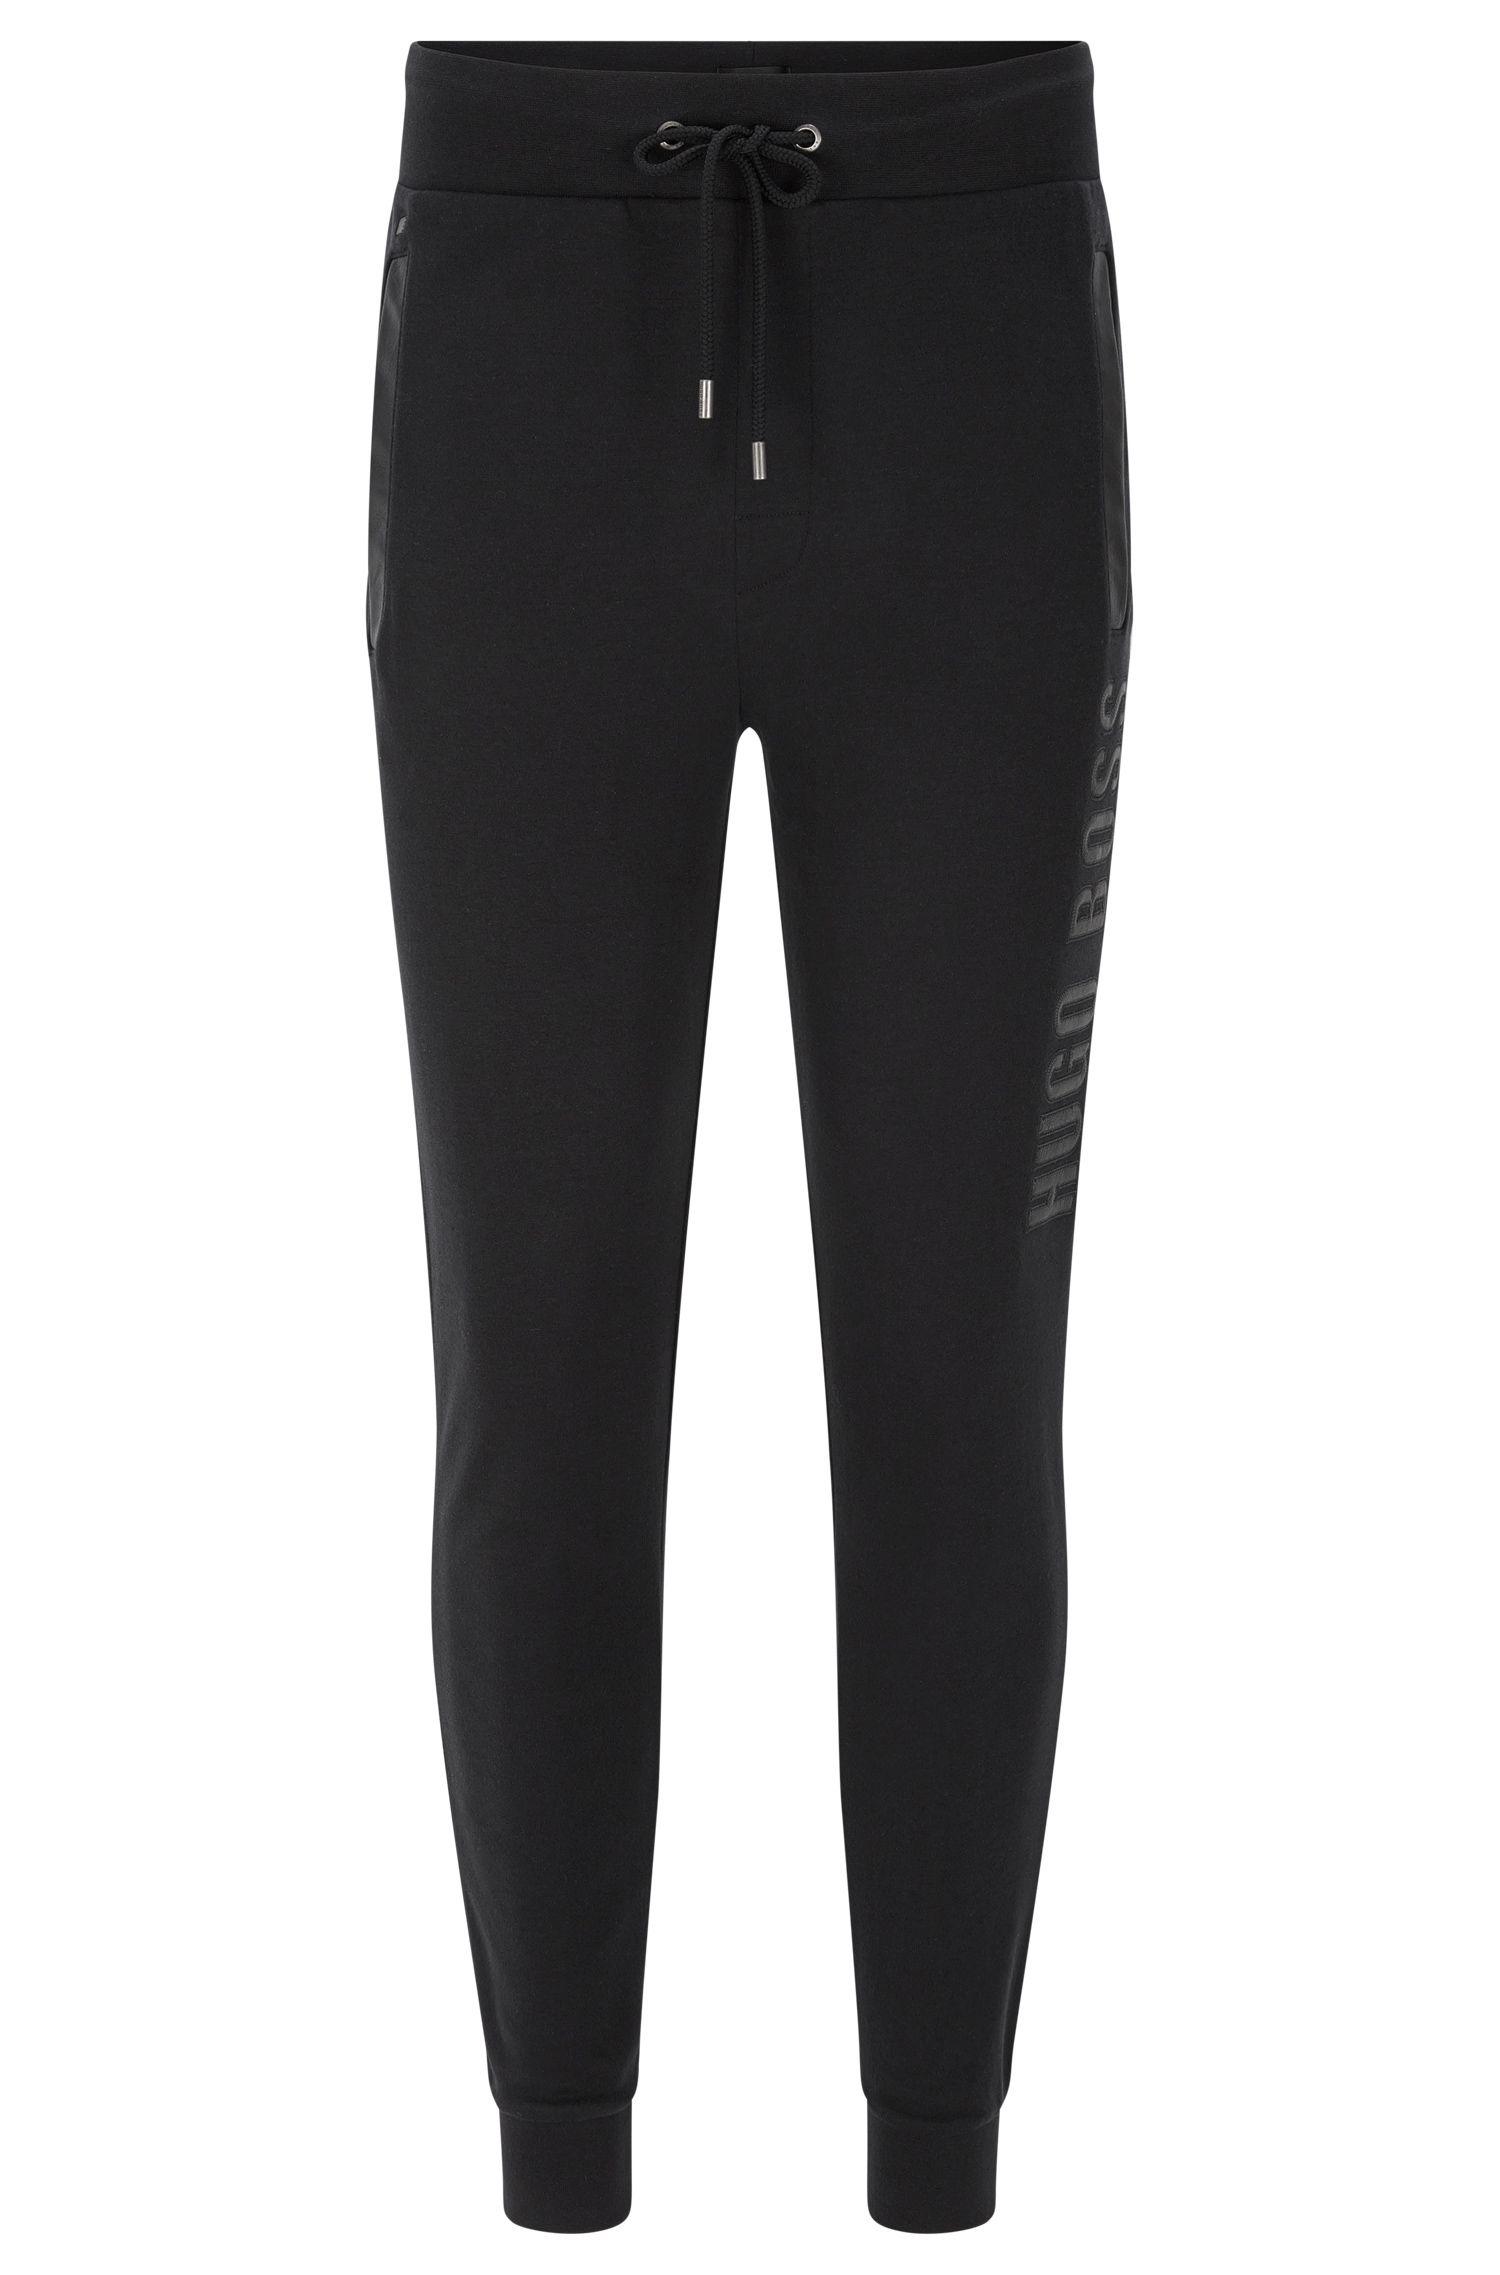 Sweathose aus Baumwolle mit Details in Leder-Optik: 'Long Pant Cuffs'